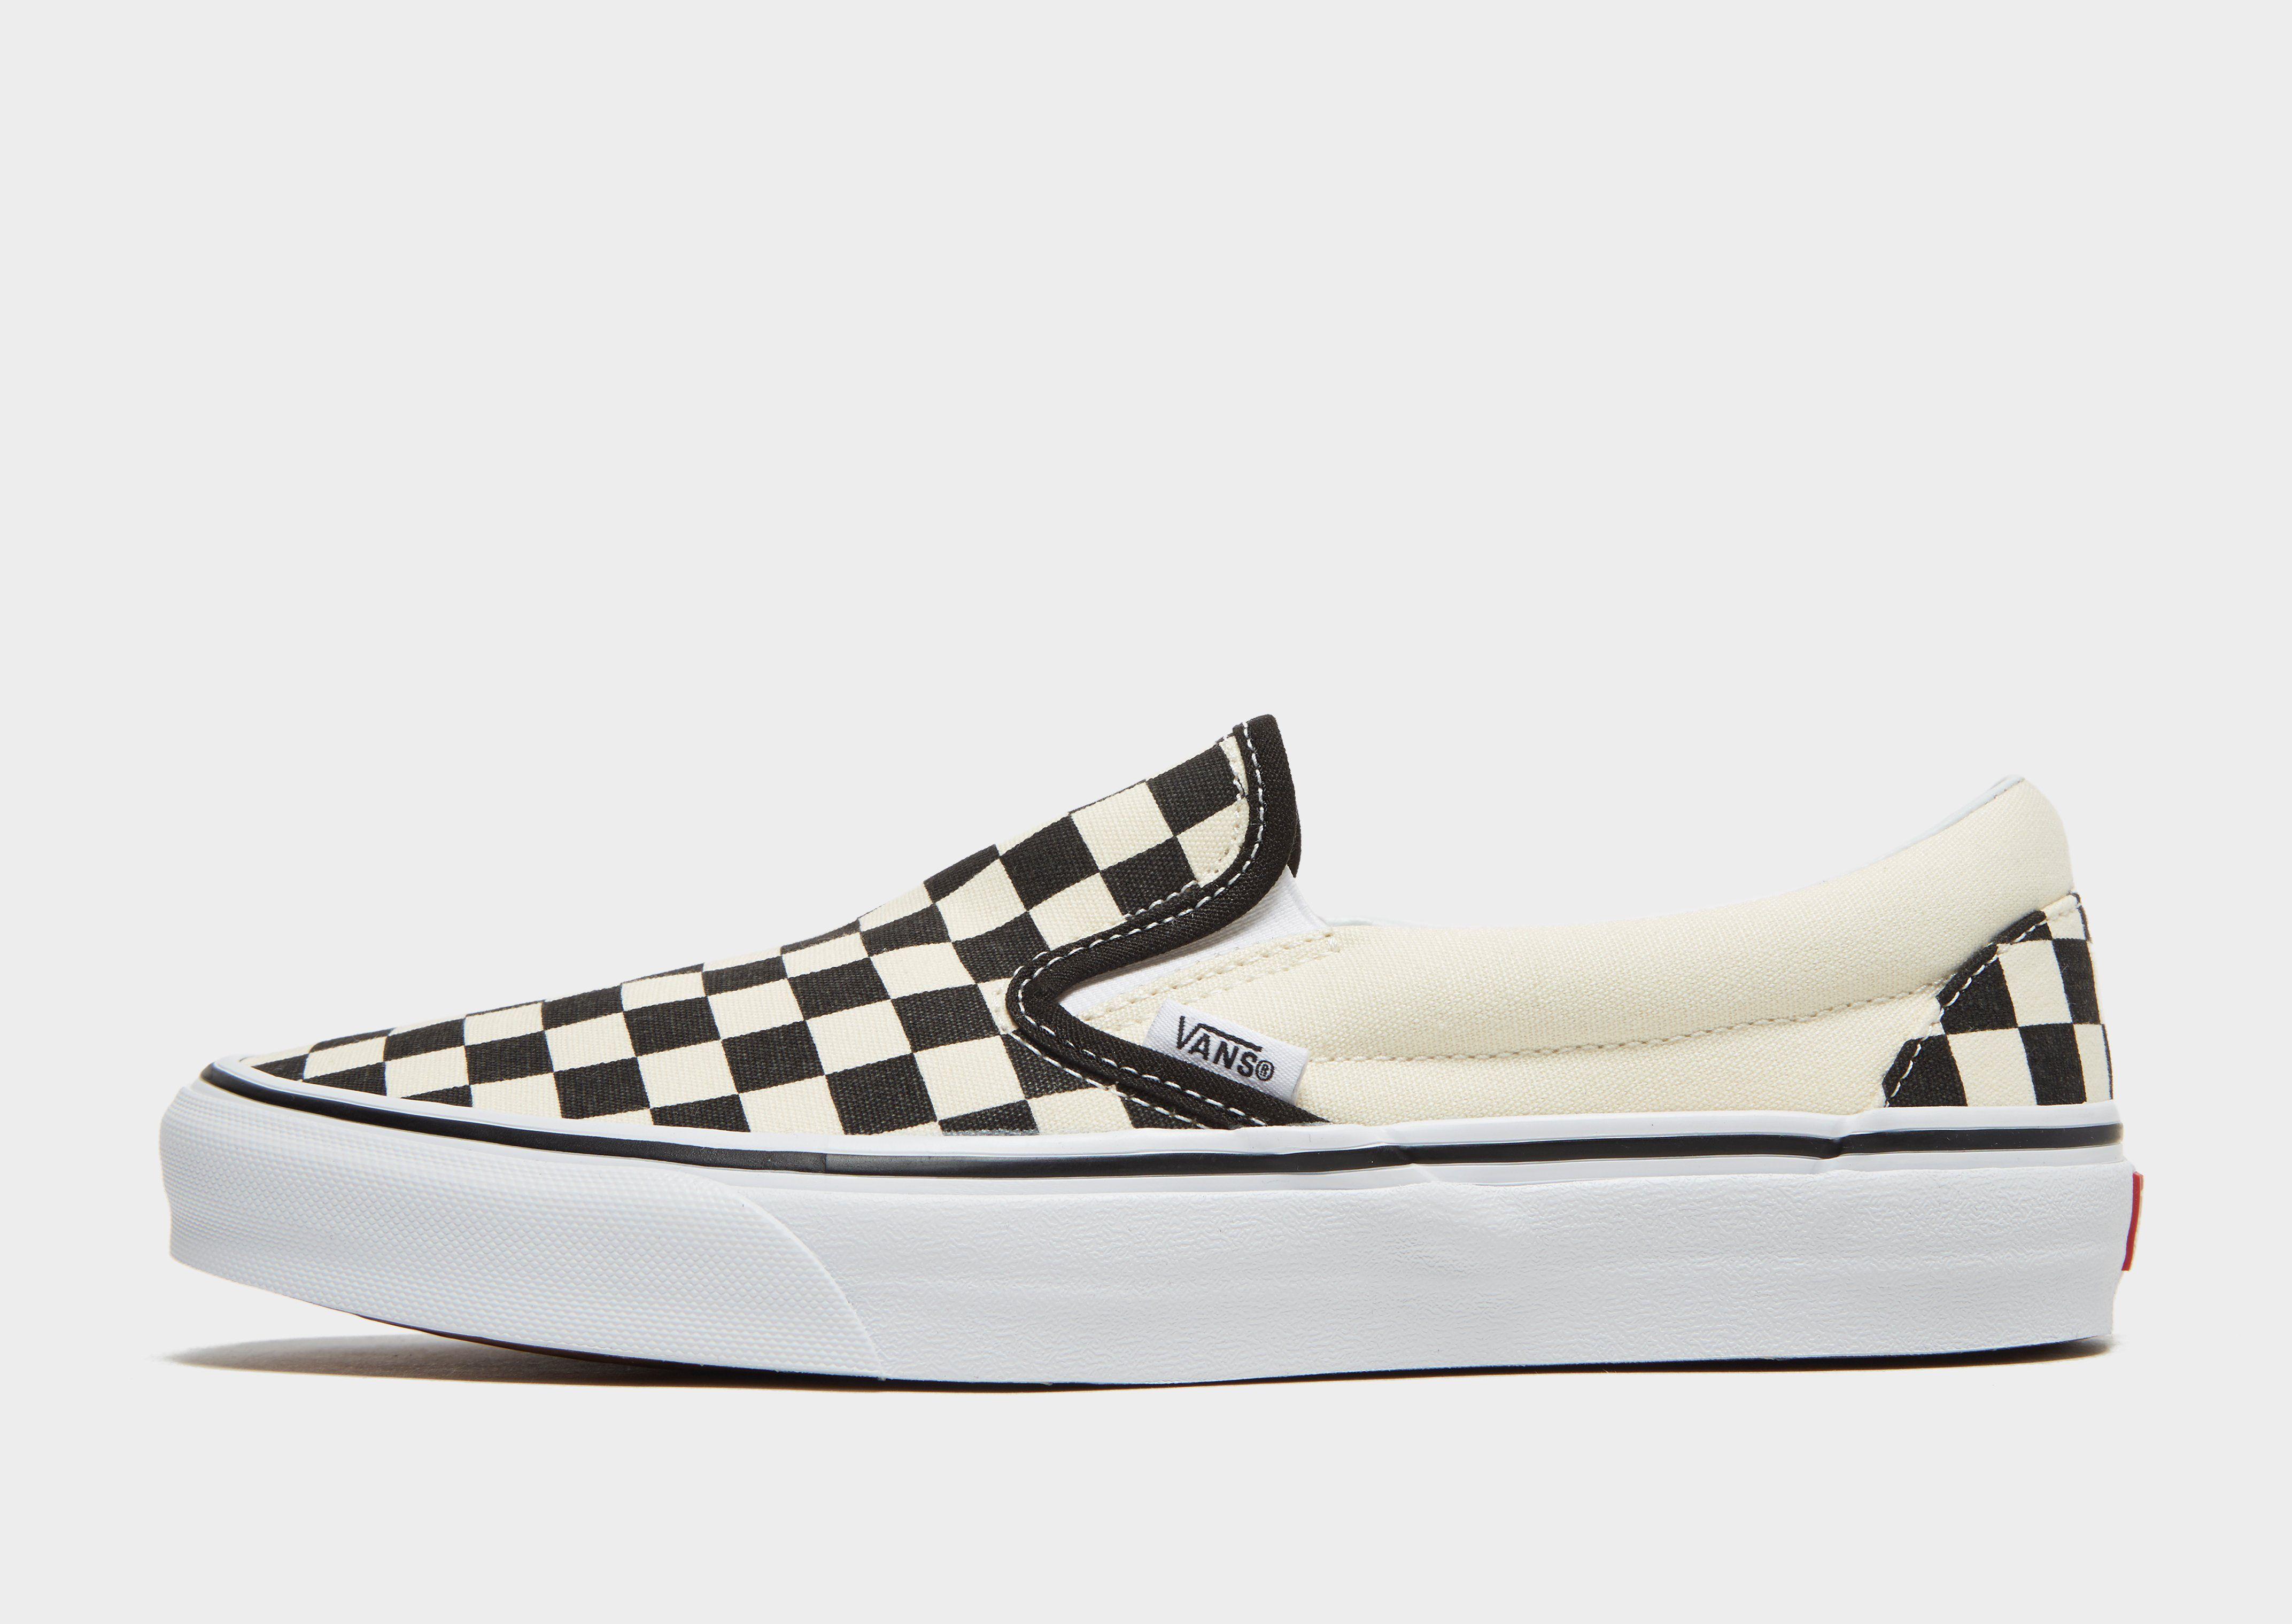 2d29b3559b9faa Vans Classic Slip-On